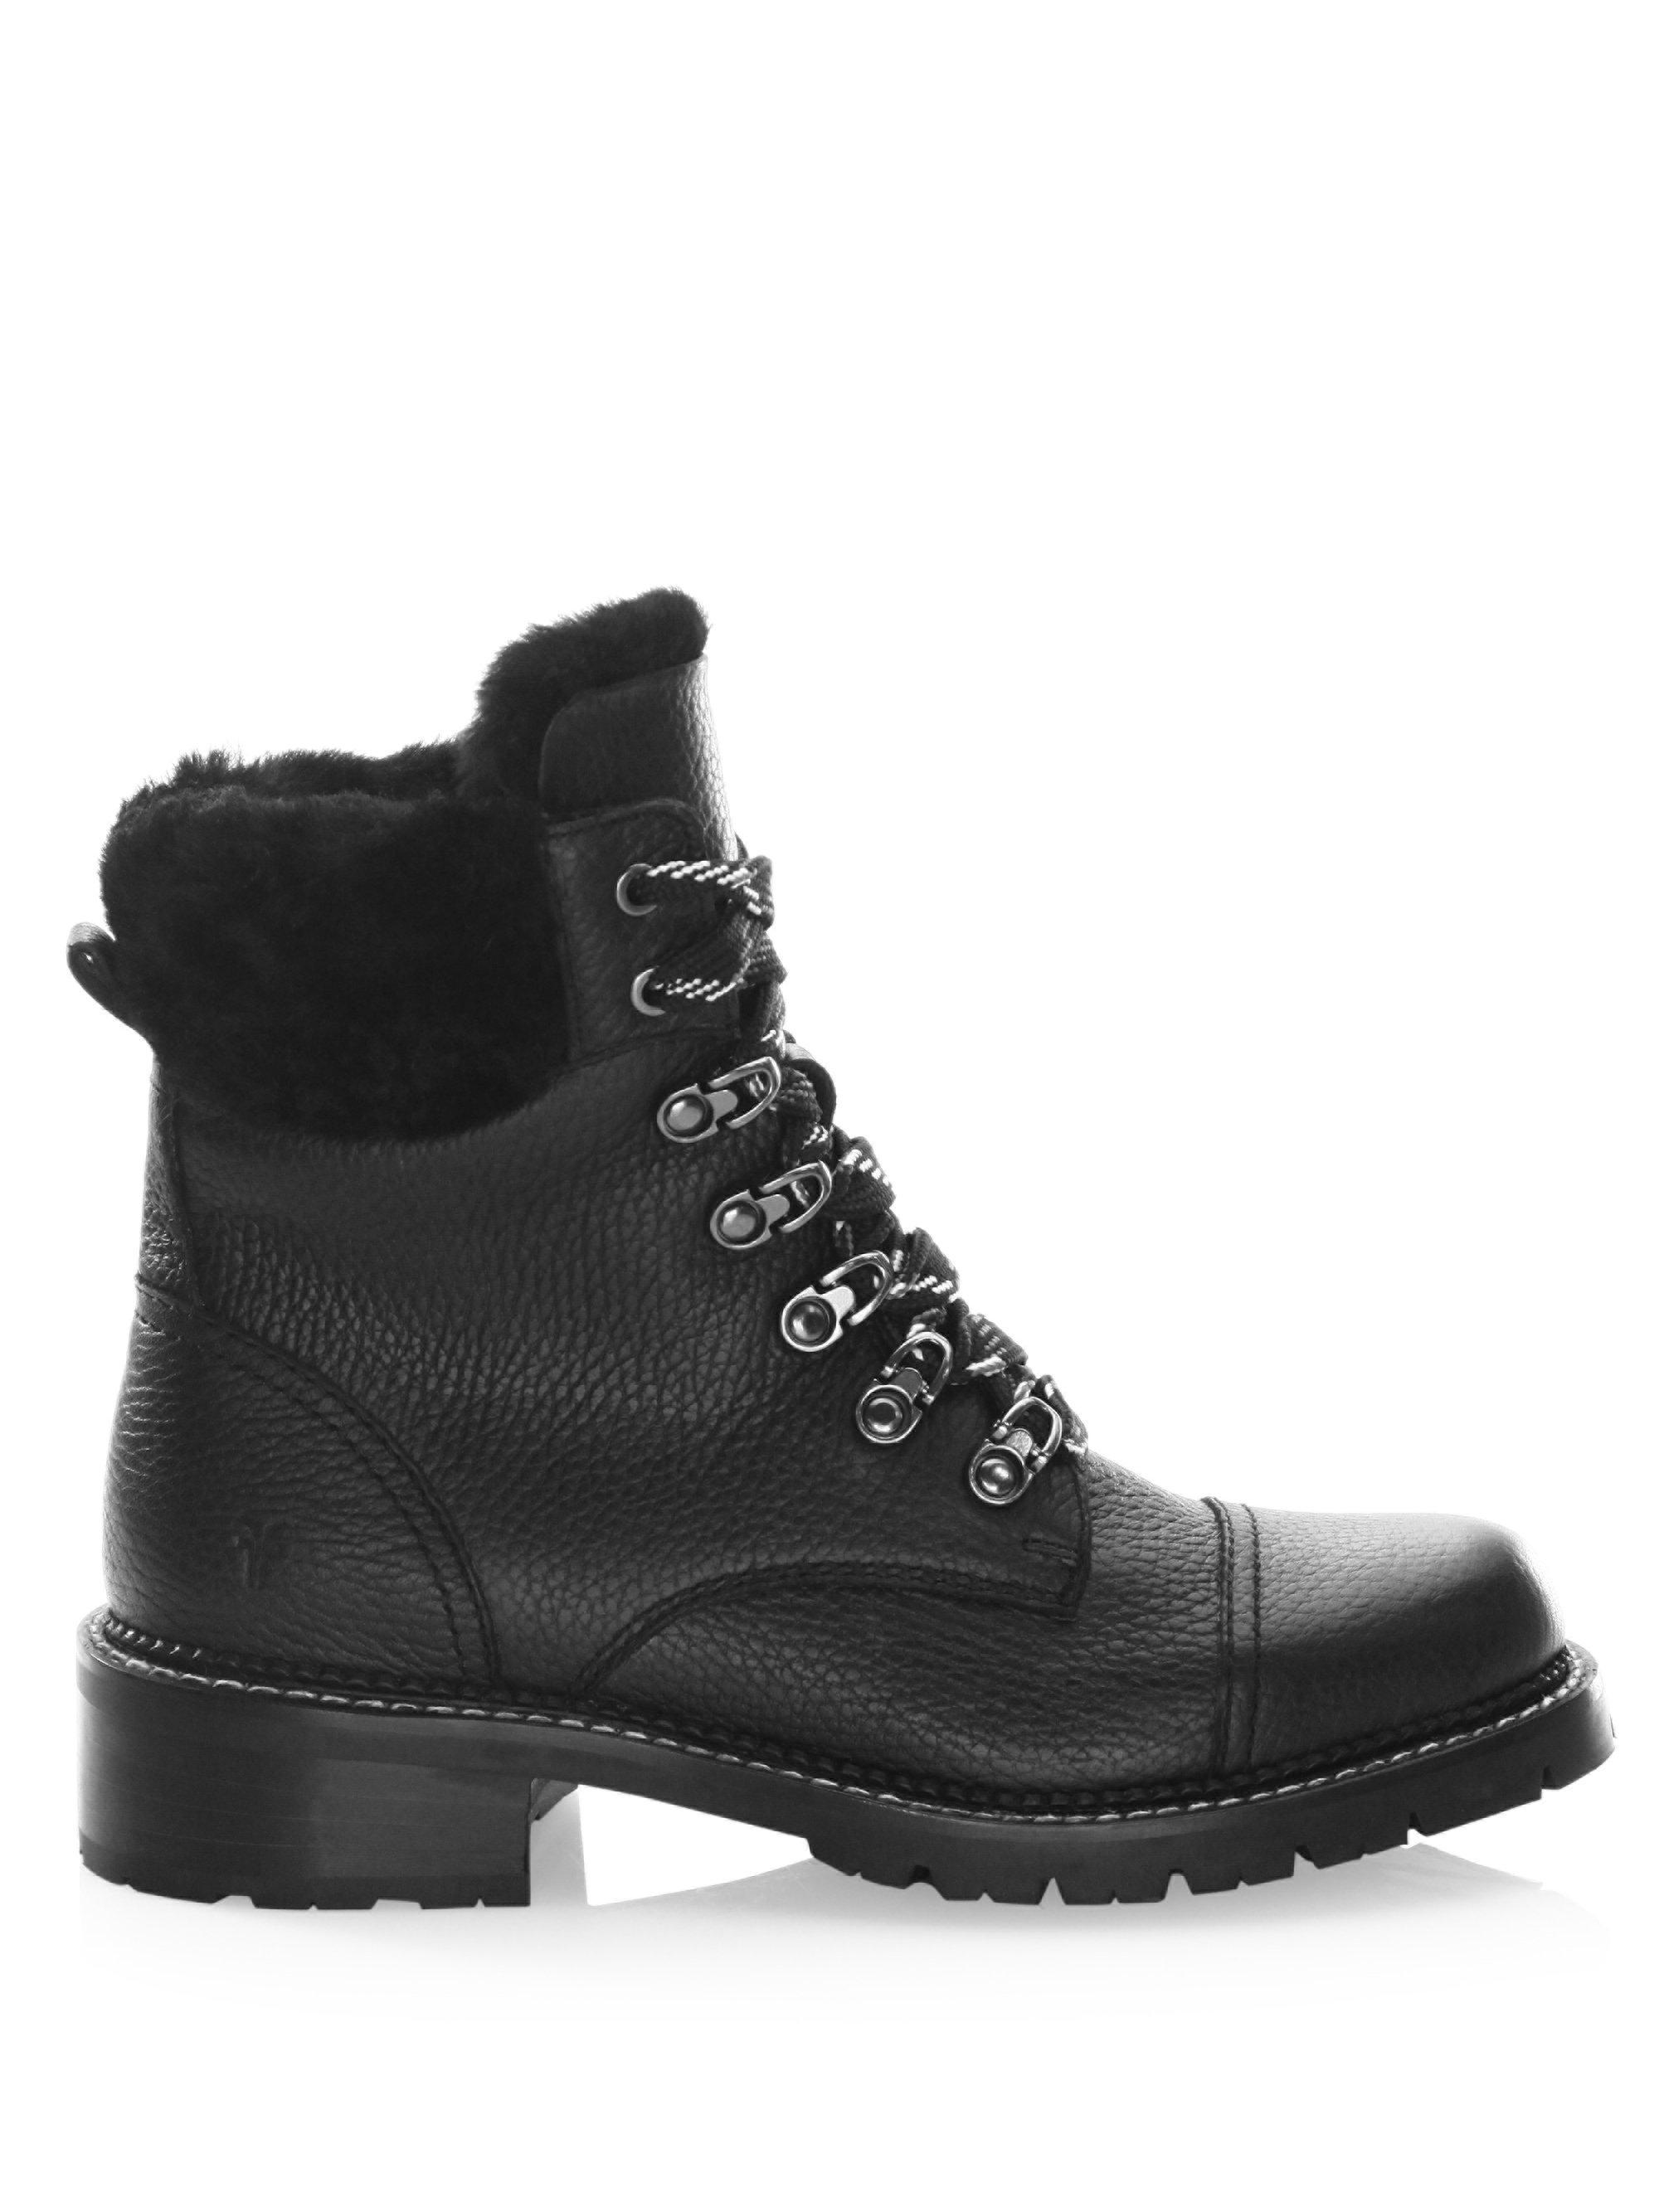 23efb4c2b45 Frye Black Samantha Shearling & Leather Hiker Boots